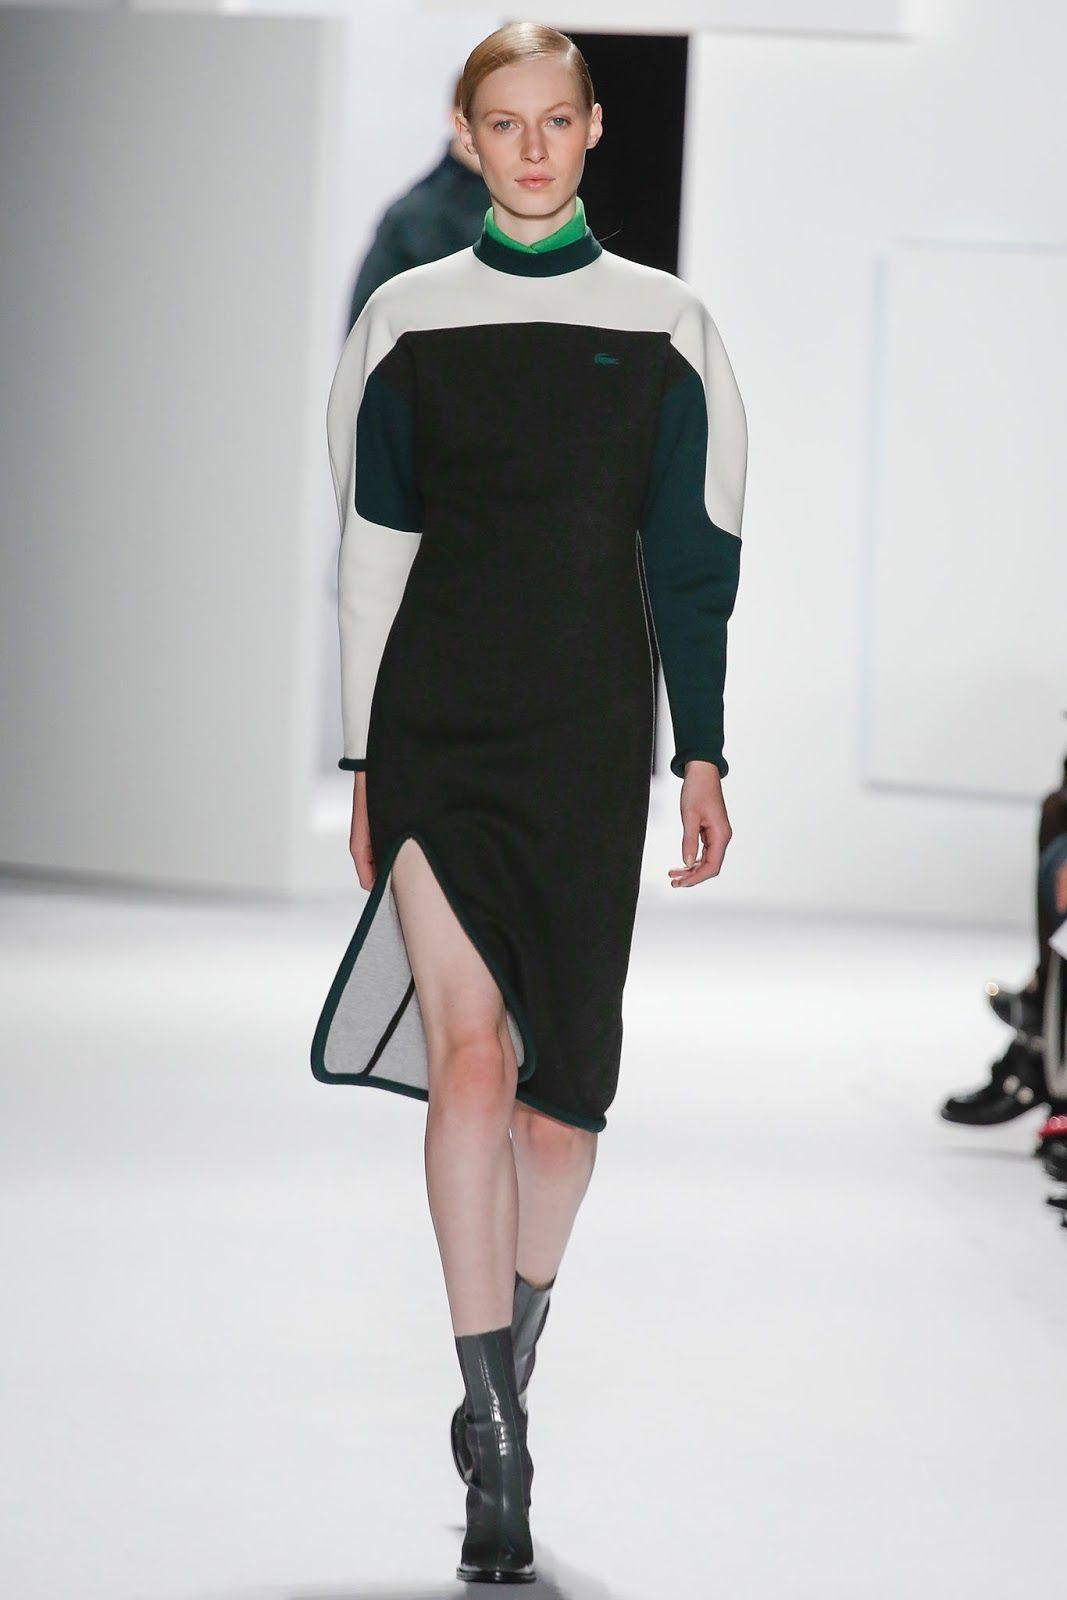 Lacoste FallWinter 2013-2014 RTW – New York Fashion Week